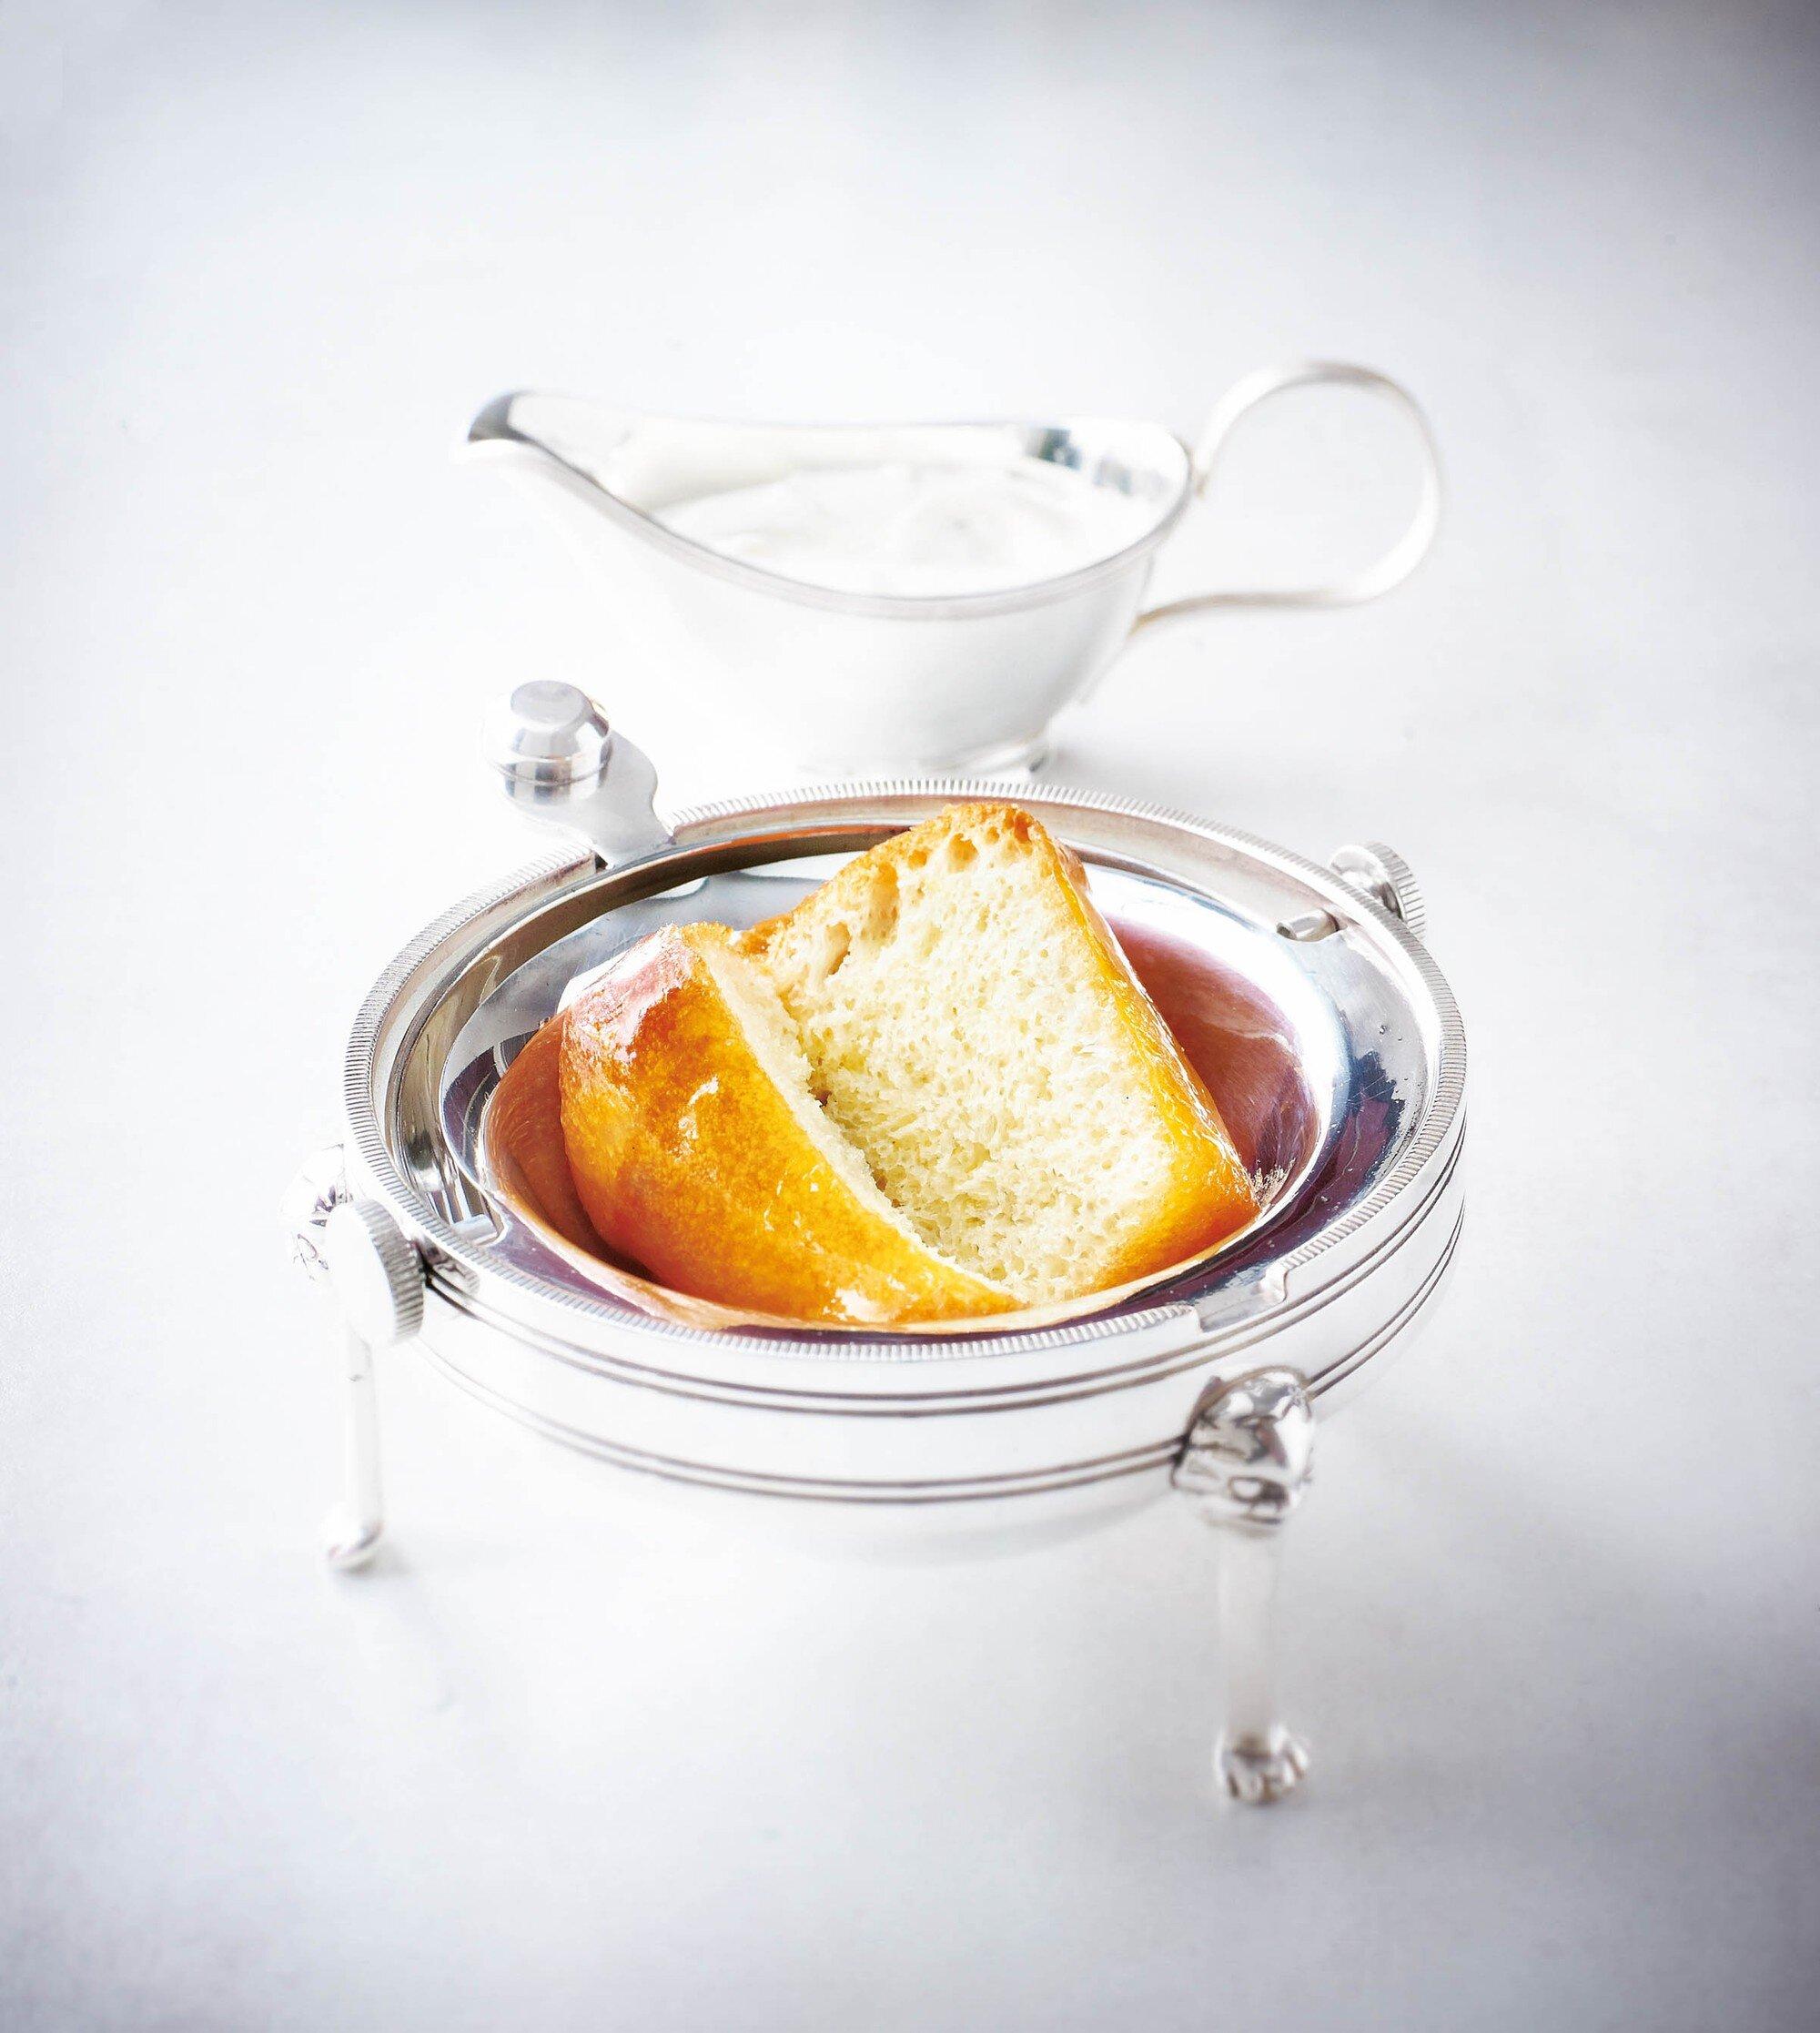 This Rum Baba is Alain Ducasse's favorite dessert.